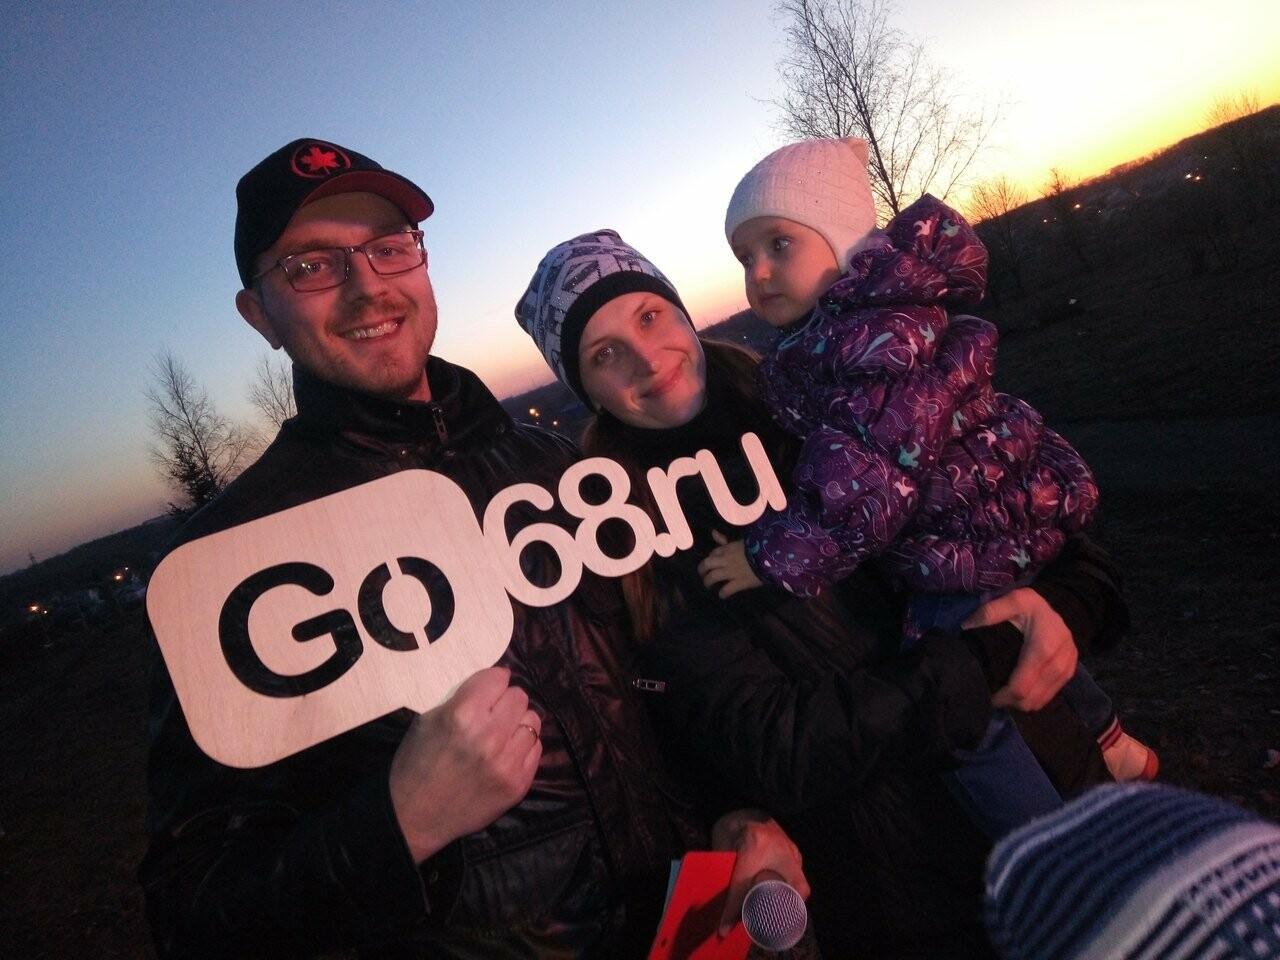 Тамбовские звездочеты получили космические подарки от Go68 и «Радио Дача», фото-5